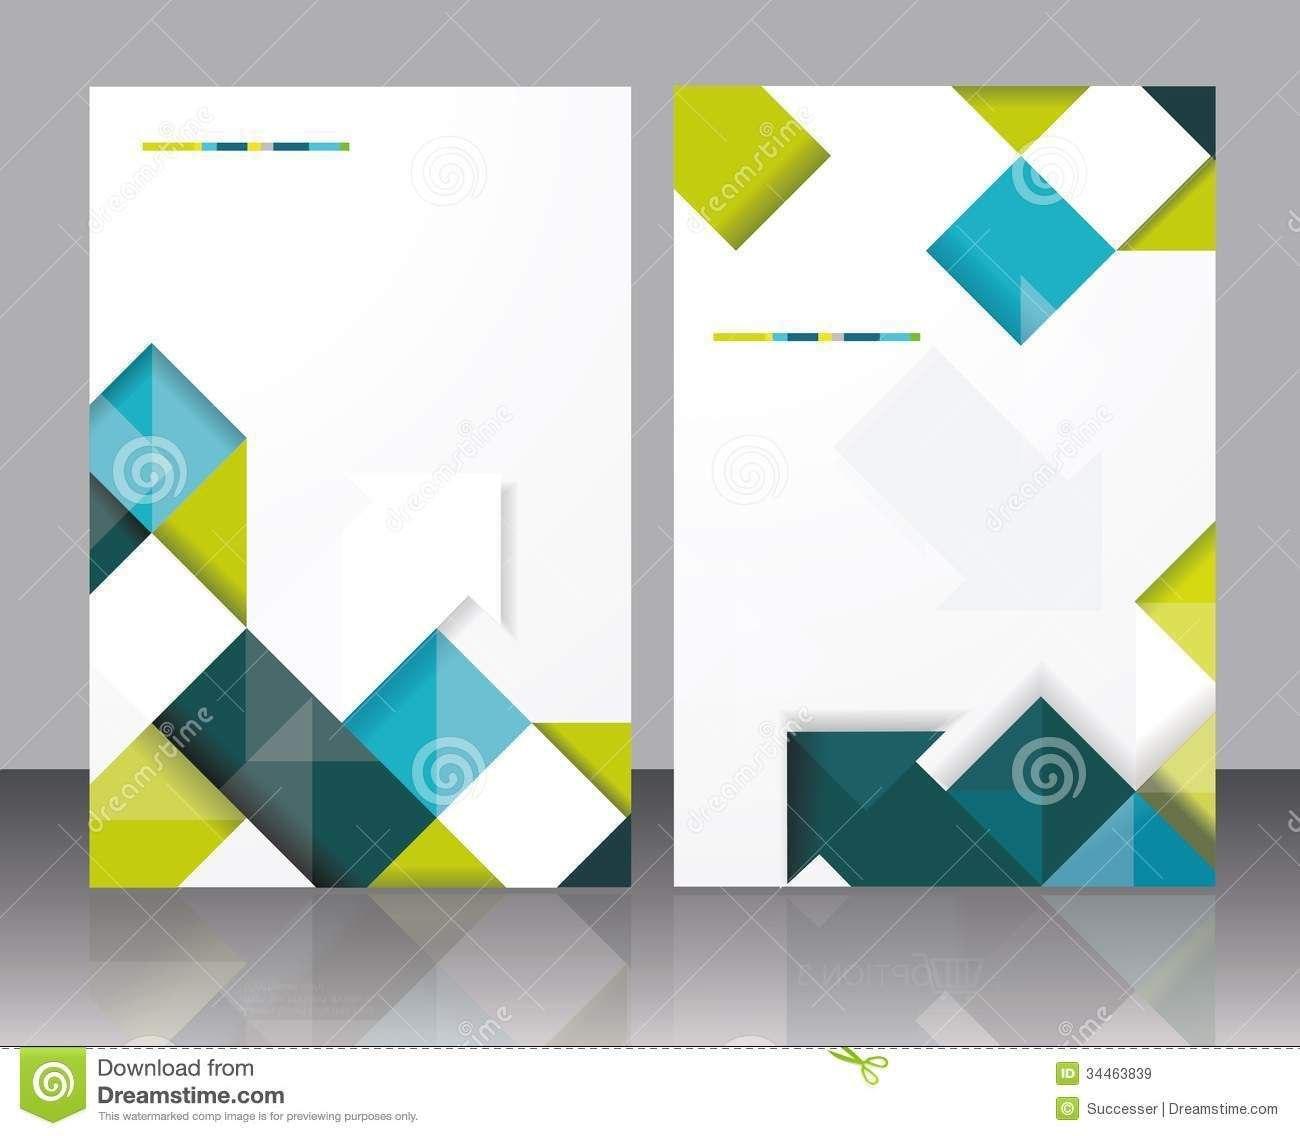 Brochure Free Template Word Brochure Template Brochure Templates Intended For Microsoft Word Brochure Template Free